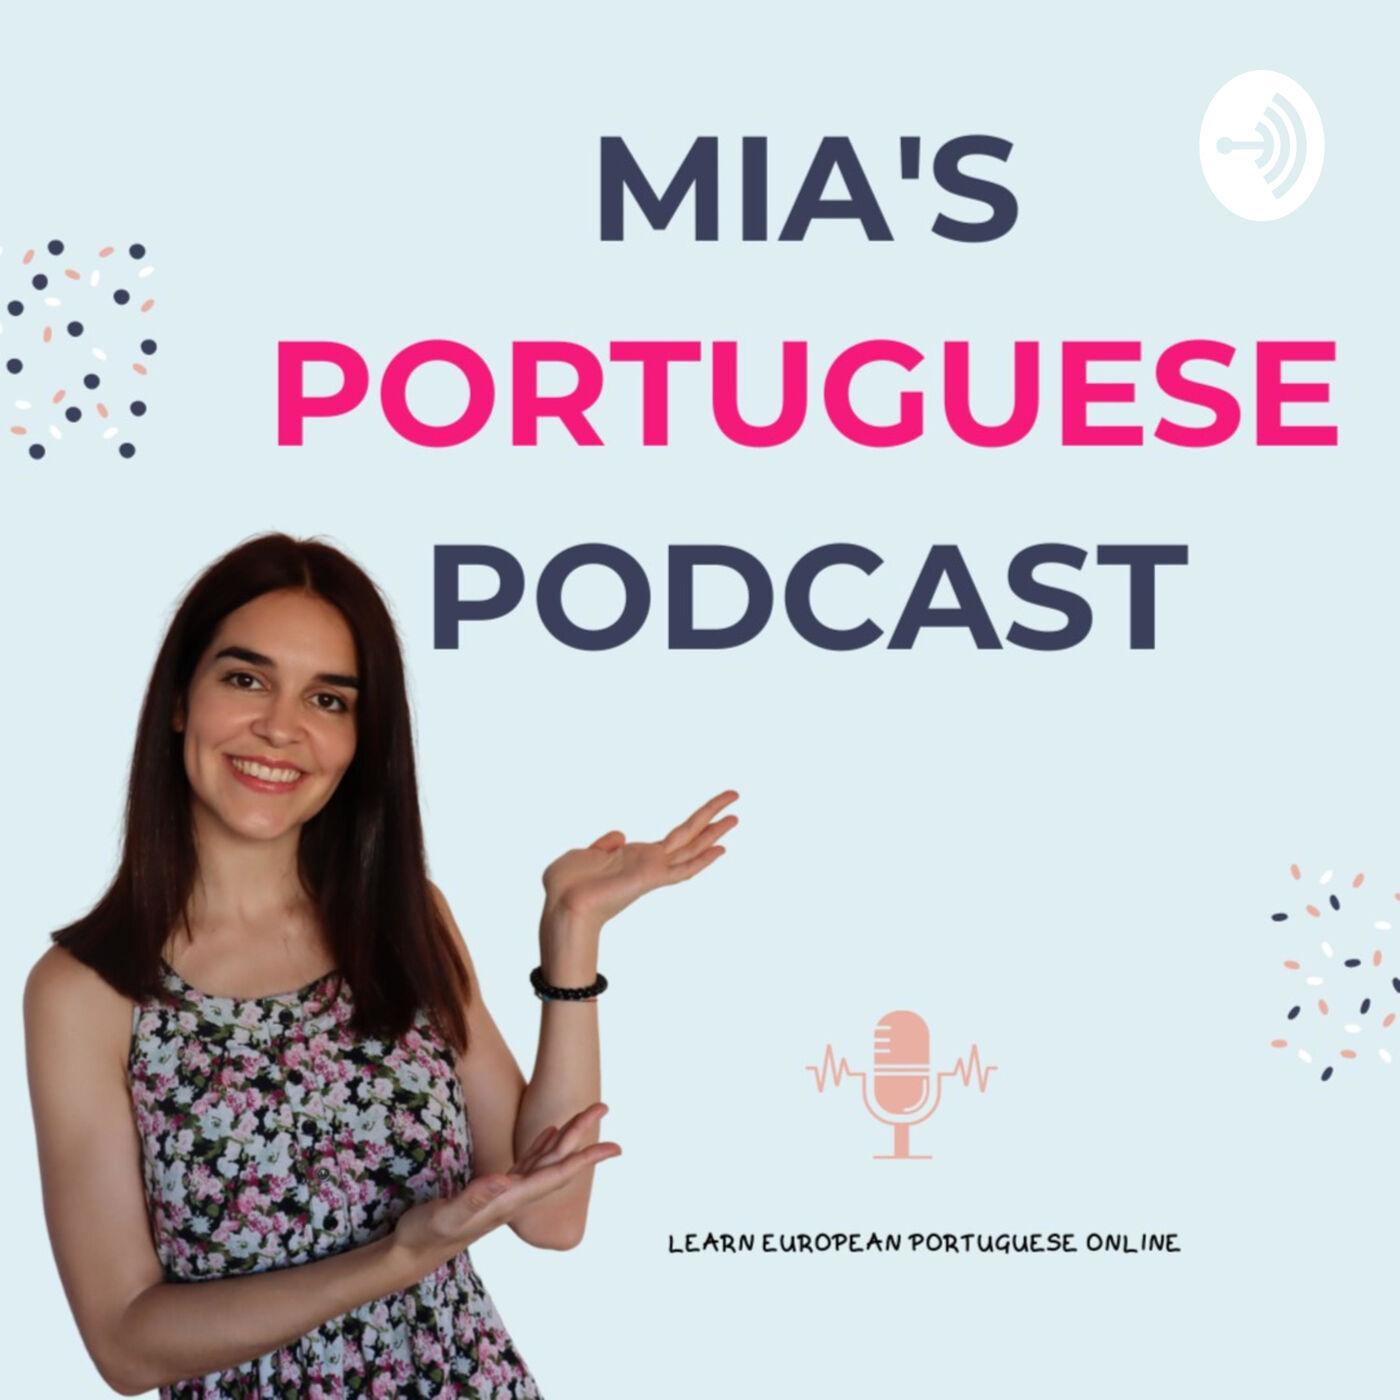 Mia's Portuguese Podcast 17 - A minha mãe